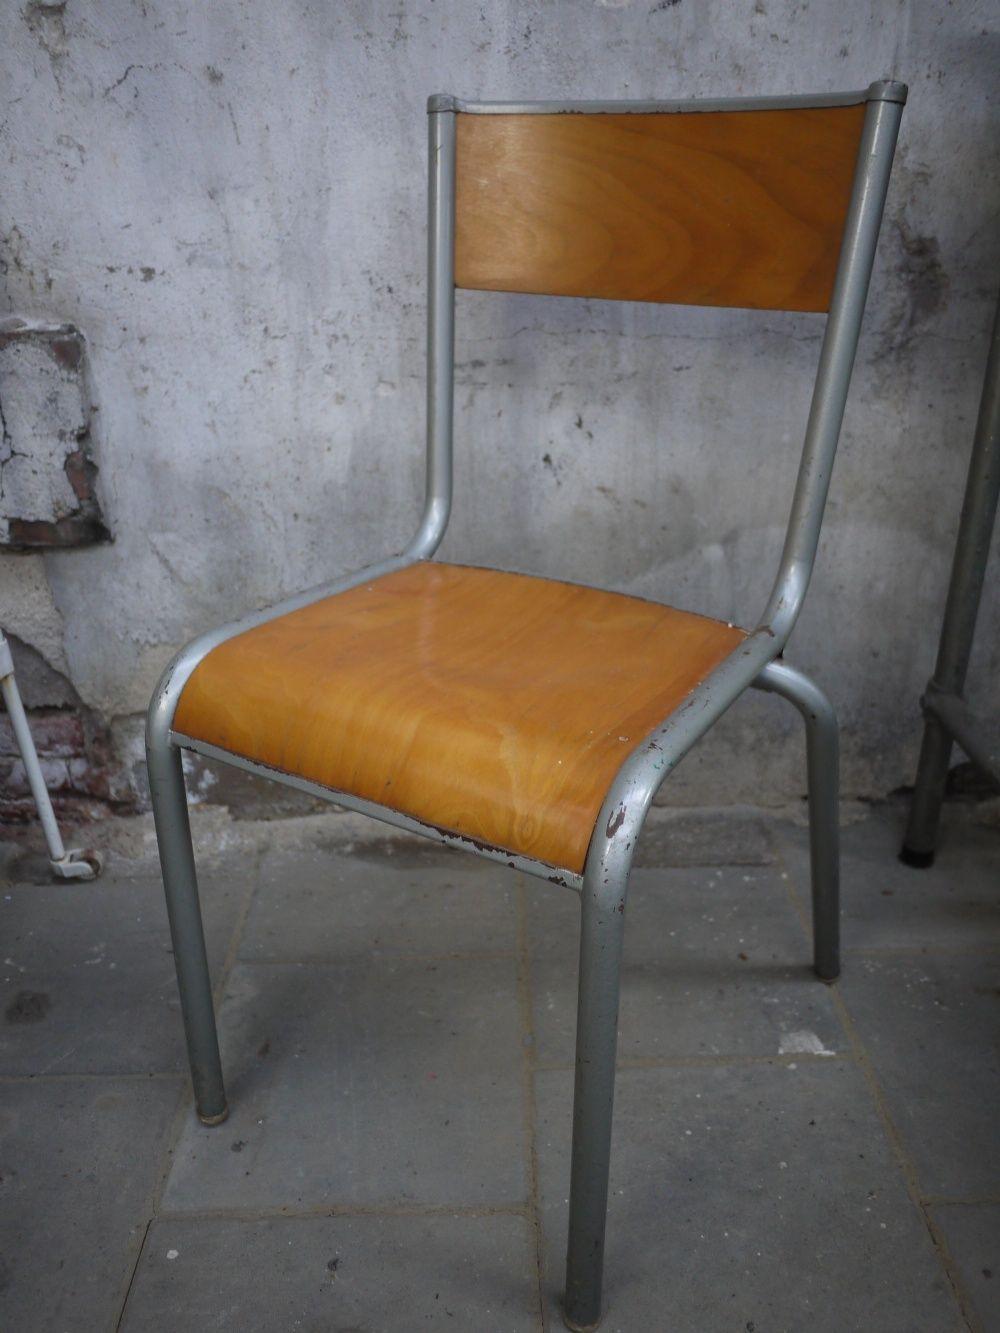 Industriele Vintage Stoelen.Industriele Vintage Stoel Met Metalen Frame En Houten